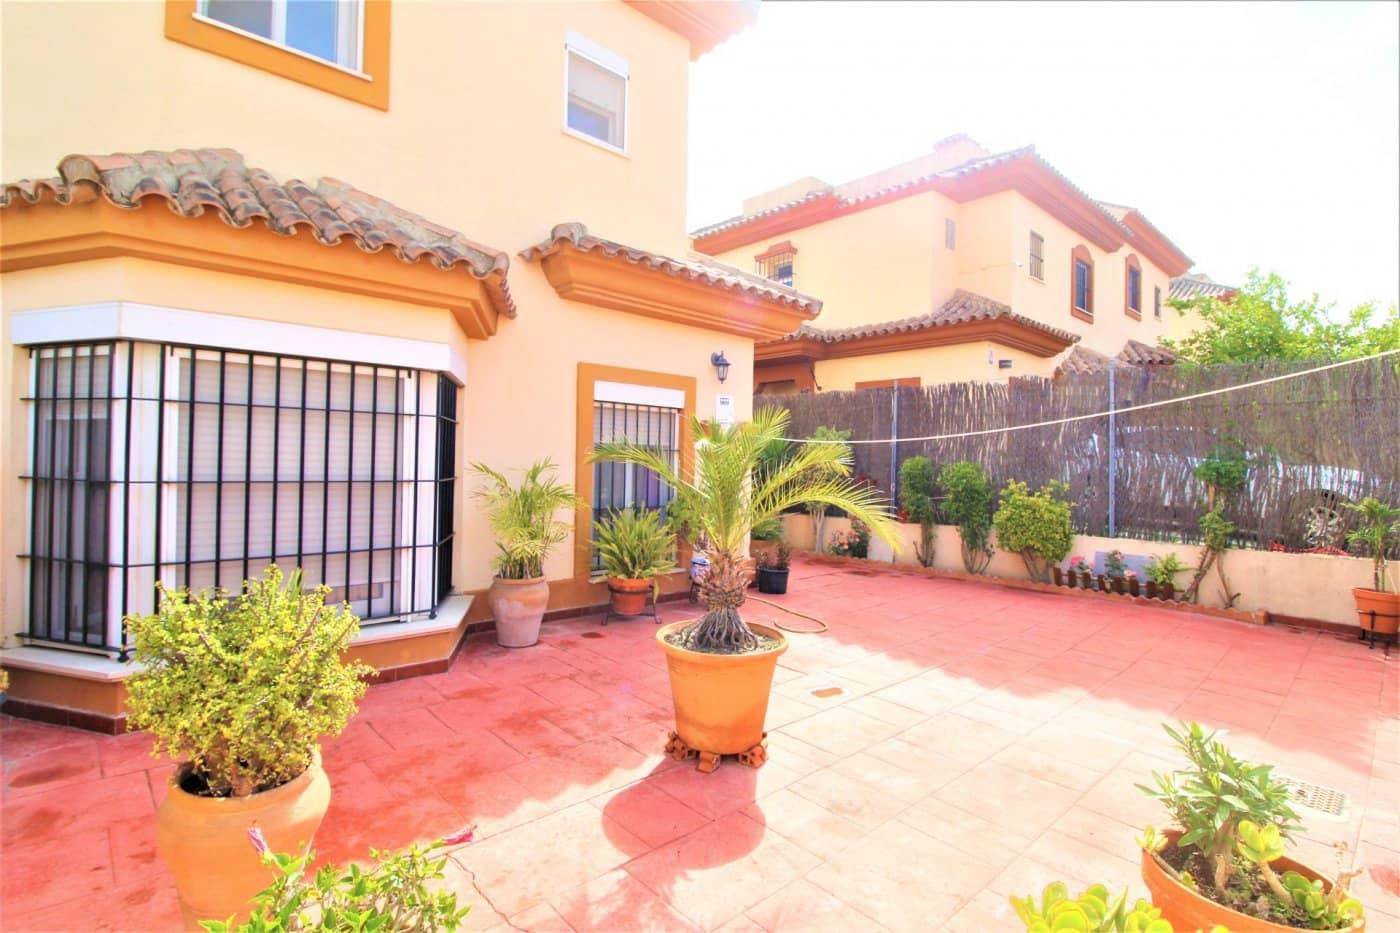 3 soveværelse Semi-Rækkehus til salg i Jerez de la Frontera med swimmingpool - € 245.000 (Ref: 6323363)